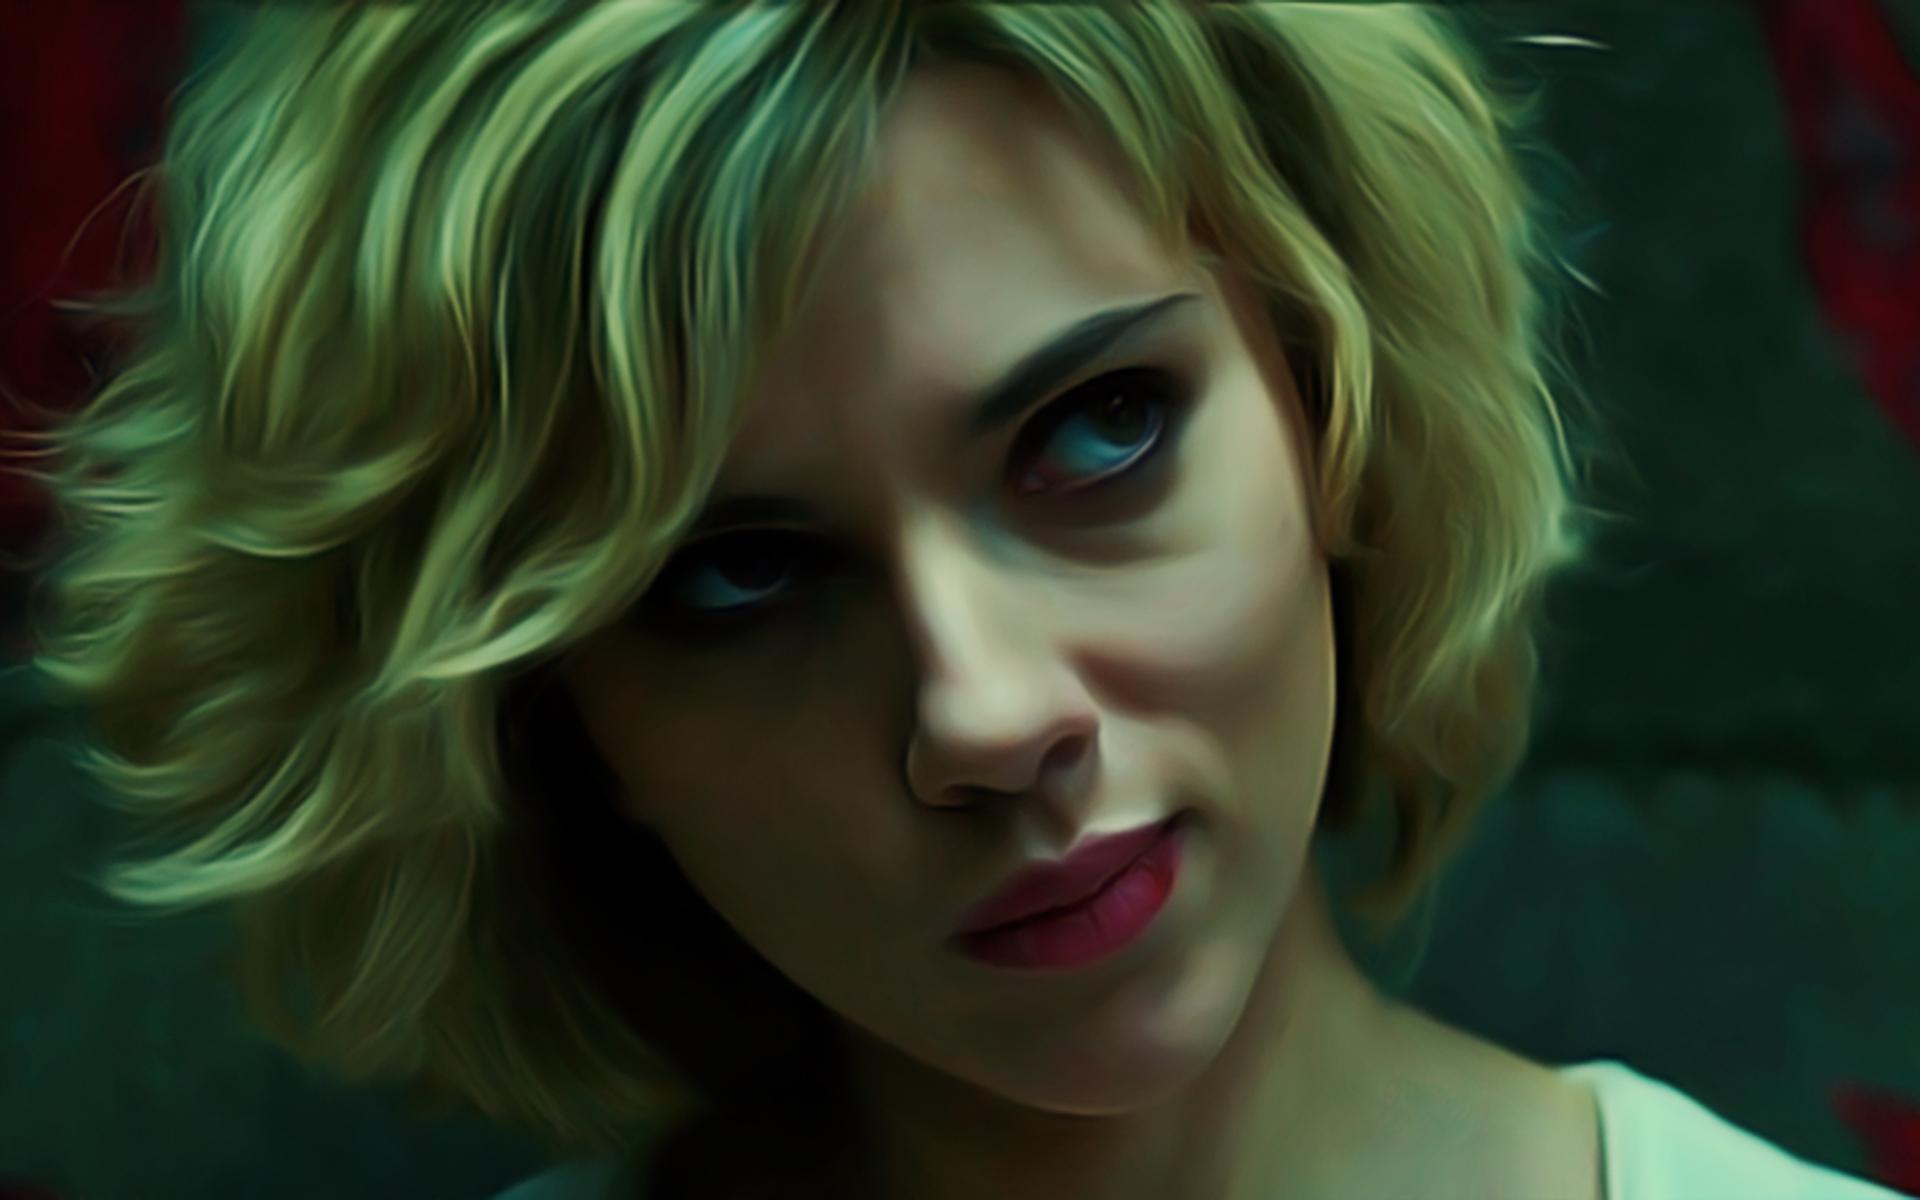 1920x1200 Lucy Scarlett Johansson 1080P Resolution HD 4k ...